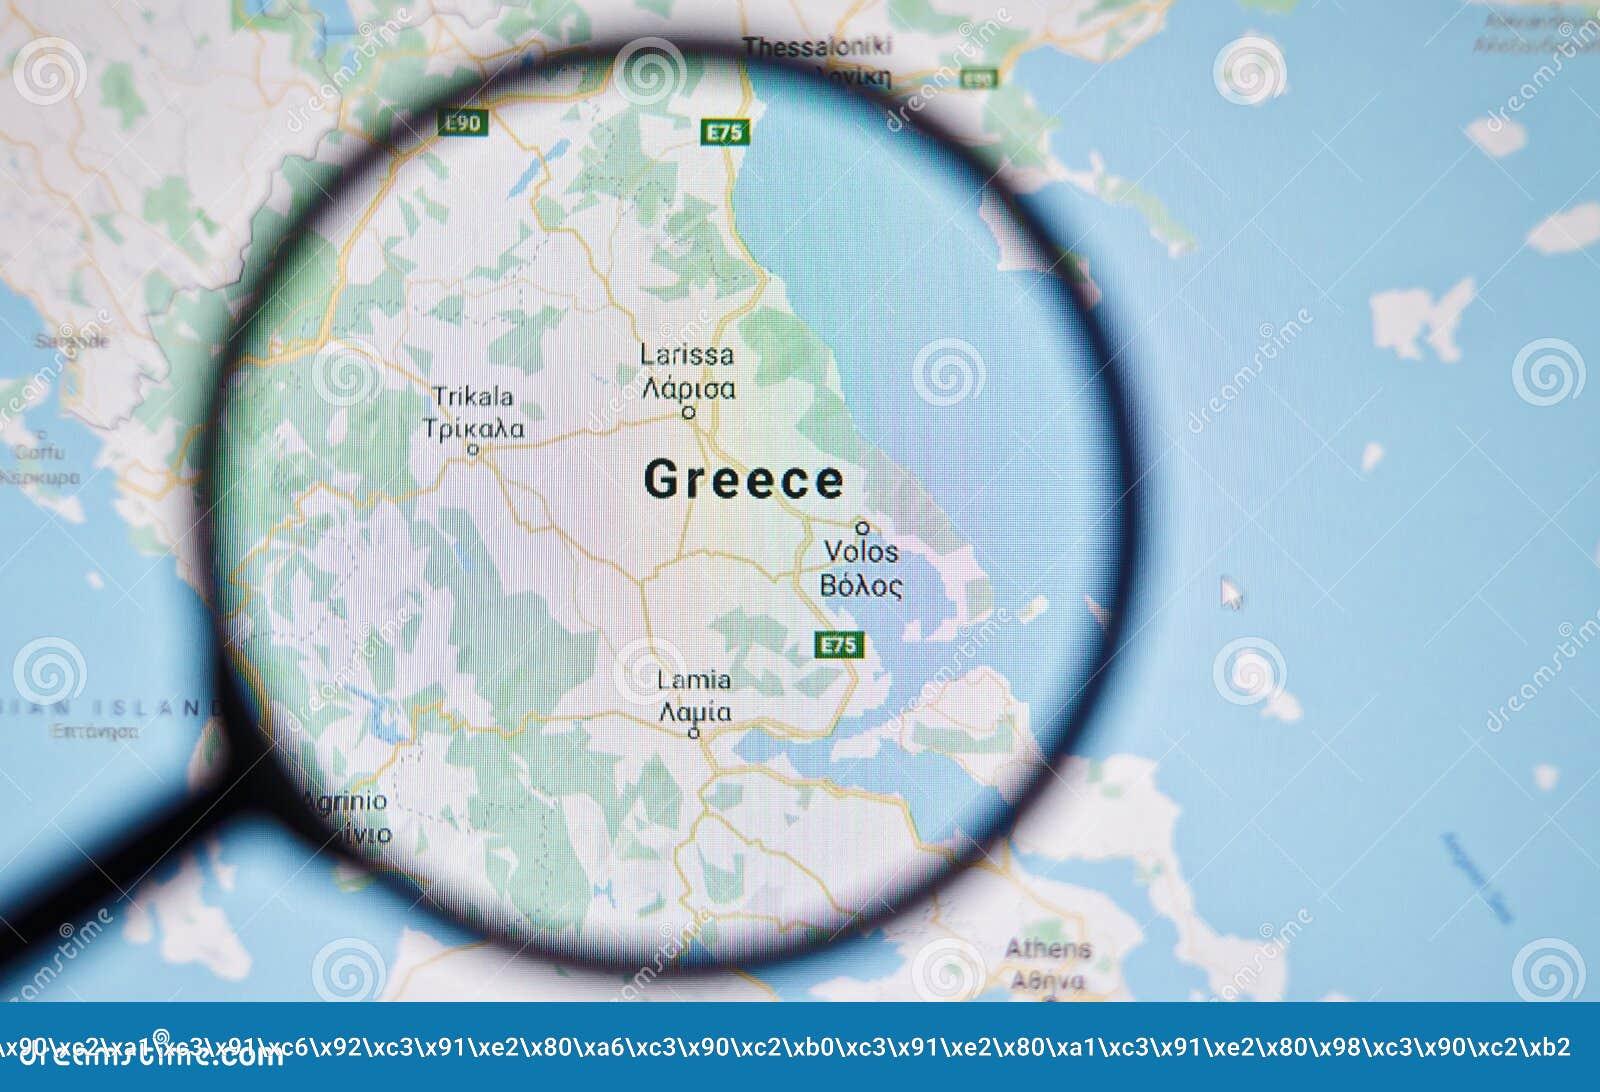 Ukraine Odessa April 25 2019 Greece On Google Maps Through